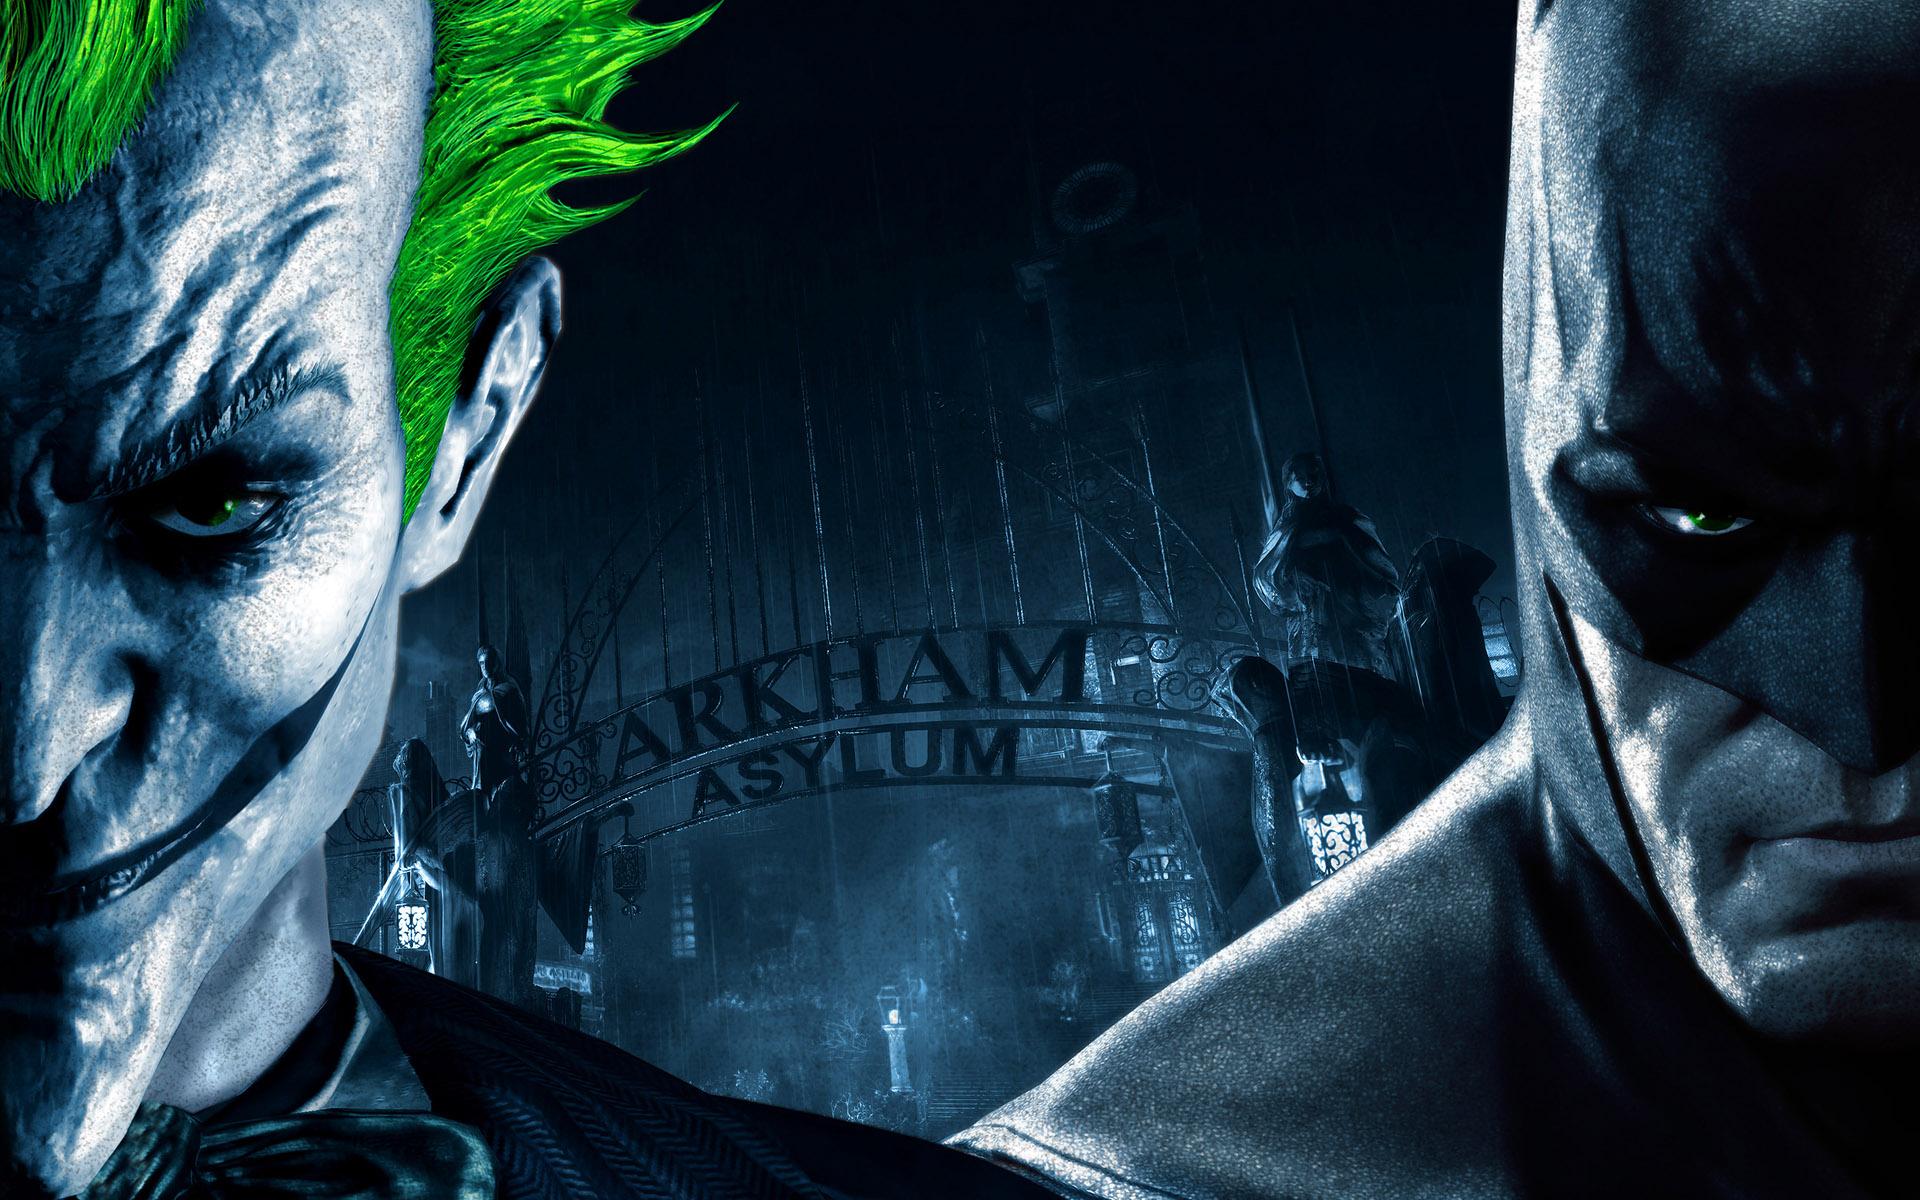 картинки бэтмен и джокер